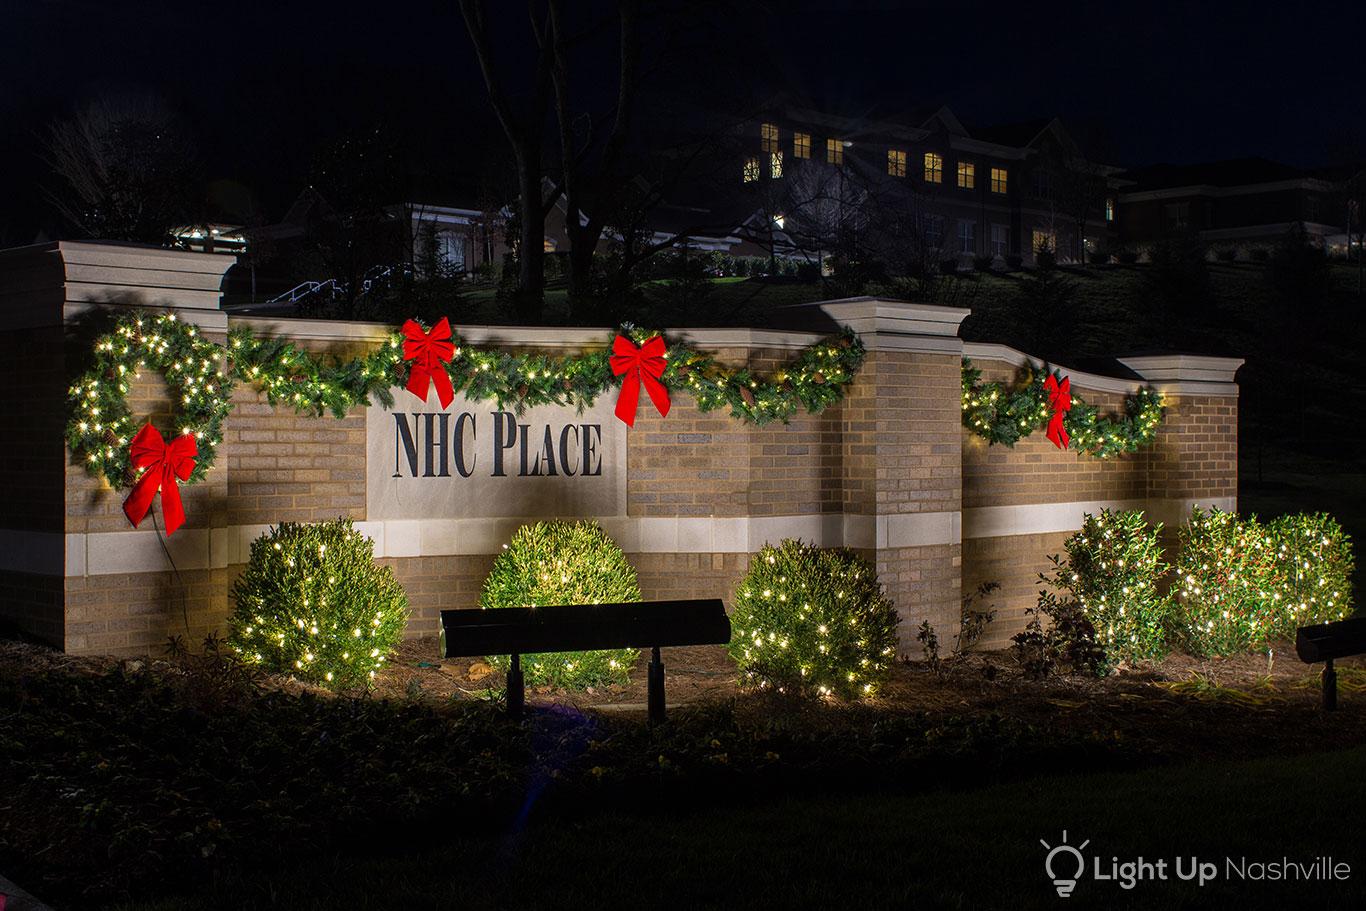 NHC-place-trace-holiday